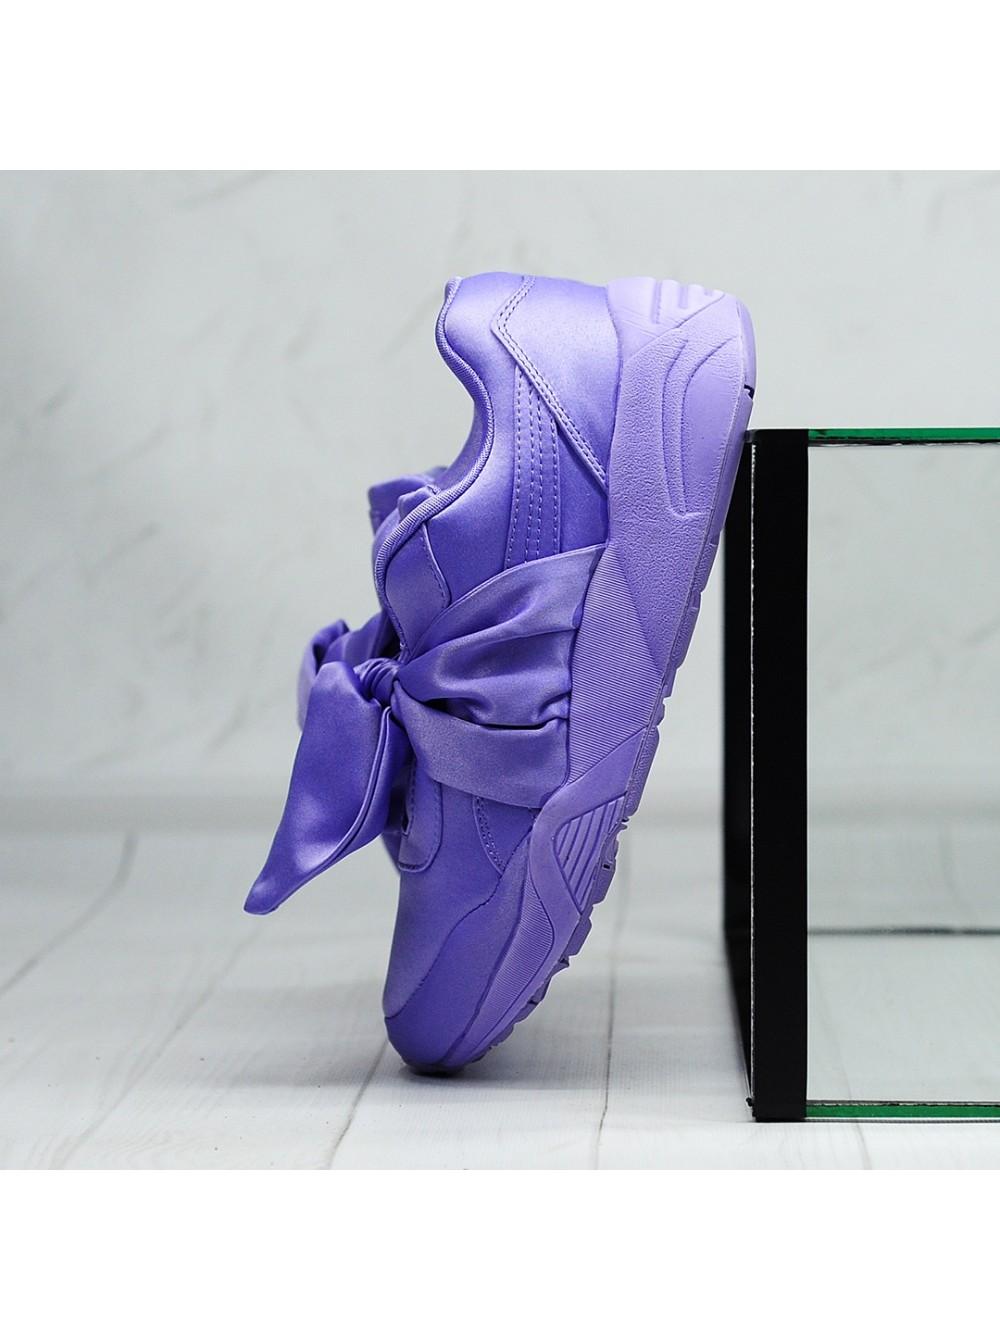 the latest fdc1e 4c5eb Кроссовки Puma Fenty x Rihanna Bow Sneaker violet